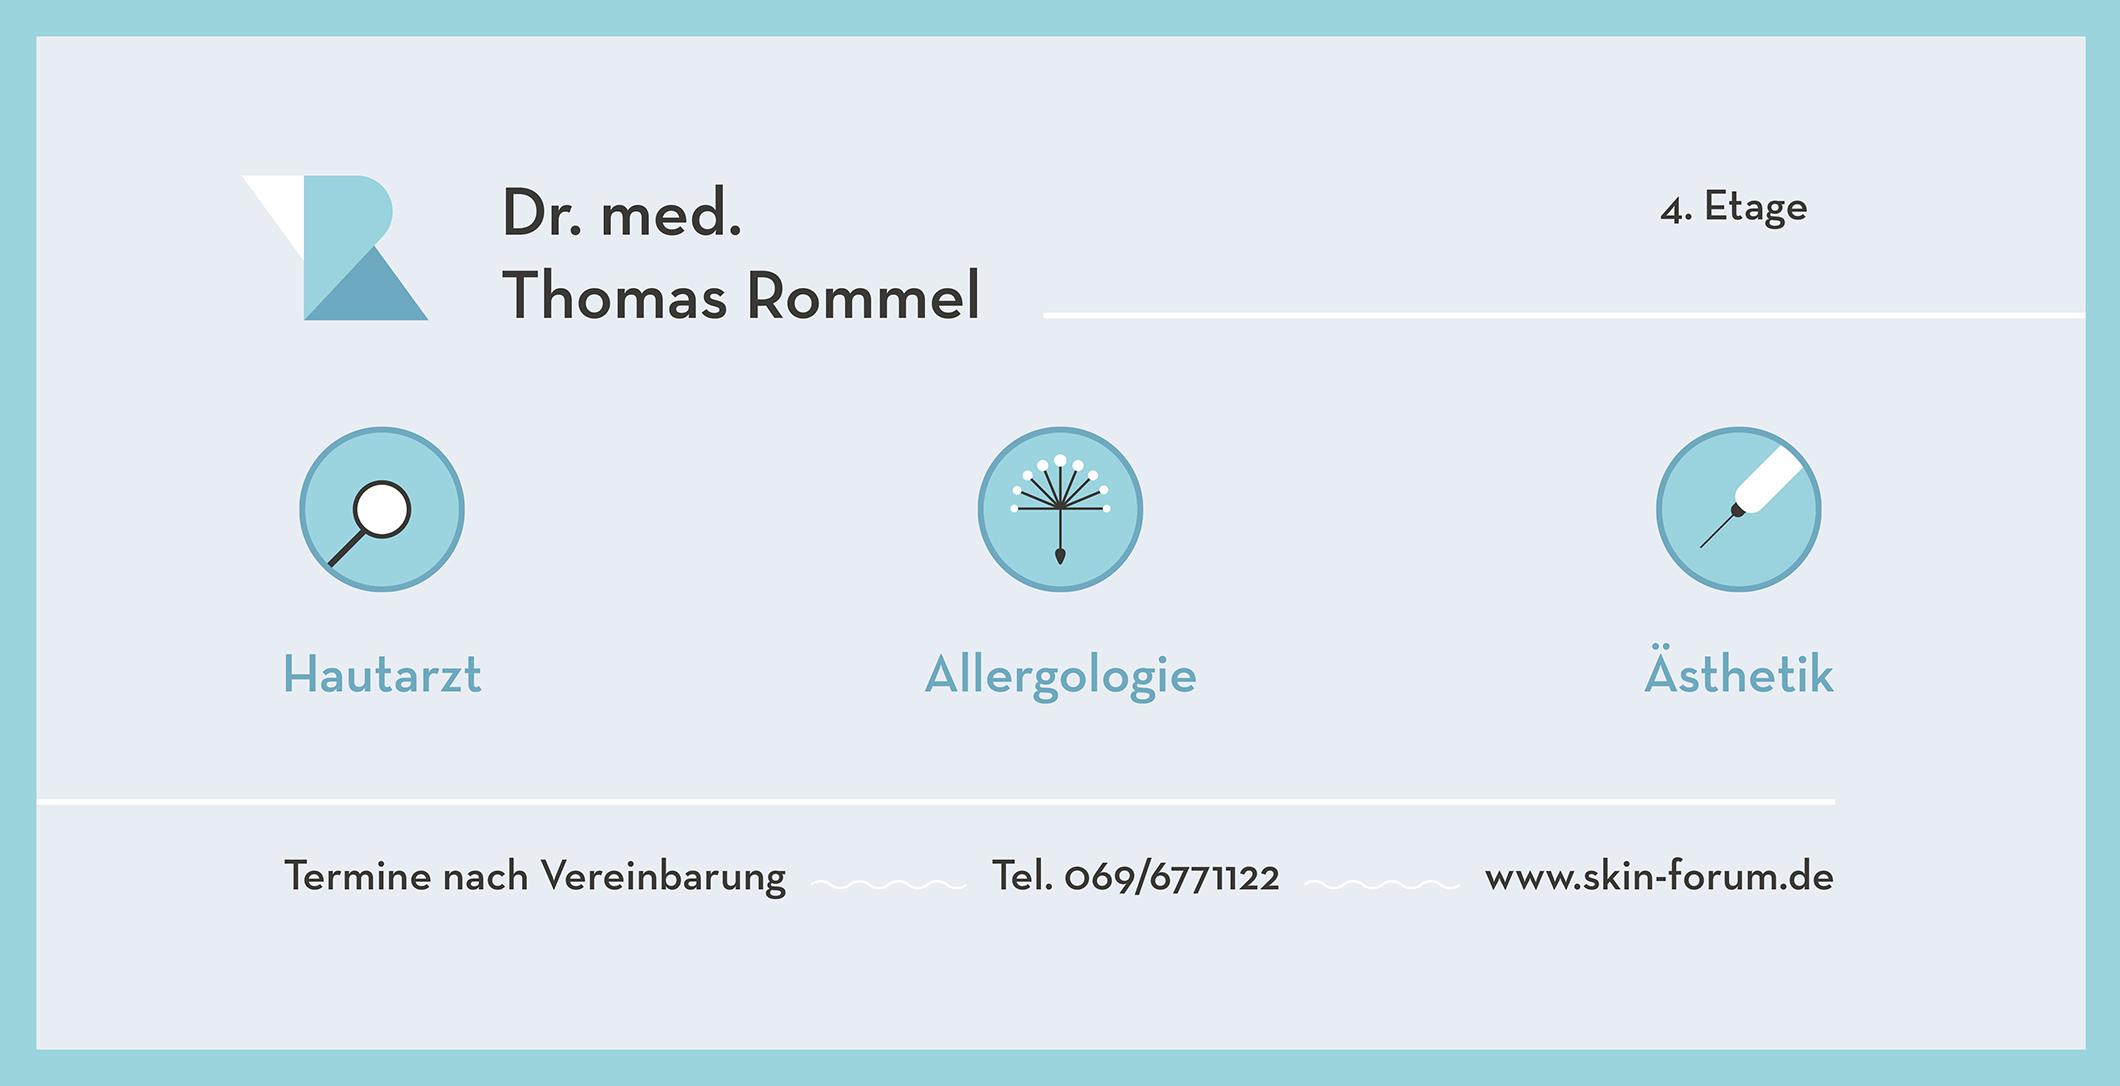 Dr. med. Thomas Rommel, Frankfurt am Main + Berger Studios, Max Berger, Maximilian Berger, Werbeagentur, Design, Cinema, Web, Kunst, Grafikdesign, Videoproduktion, Webdesign, Kunstverkauf, Digitale & Analoge Werbung aus einer Hand